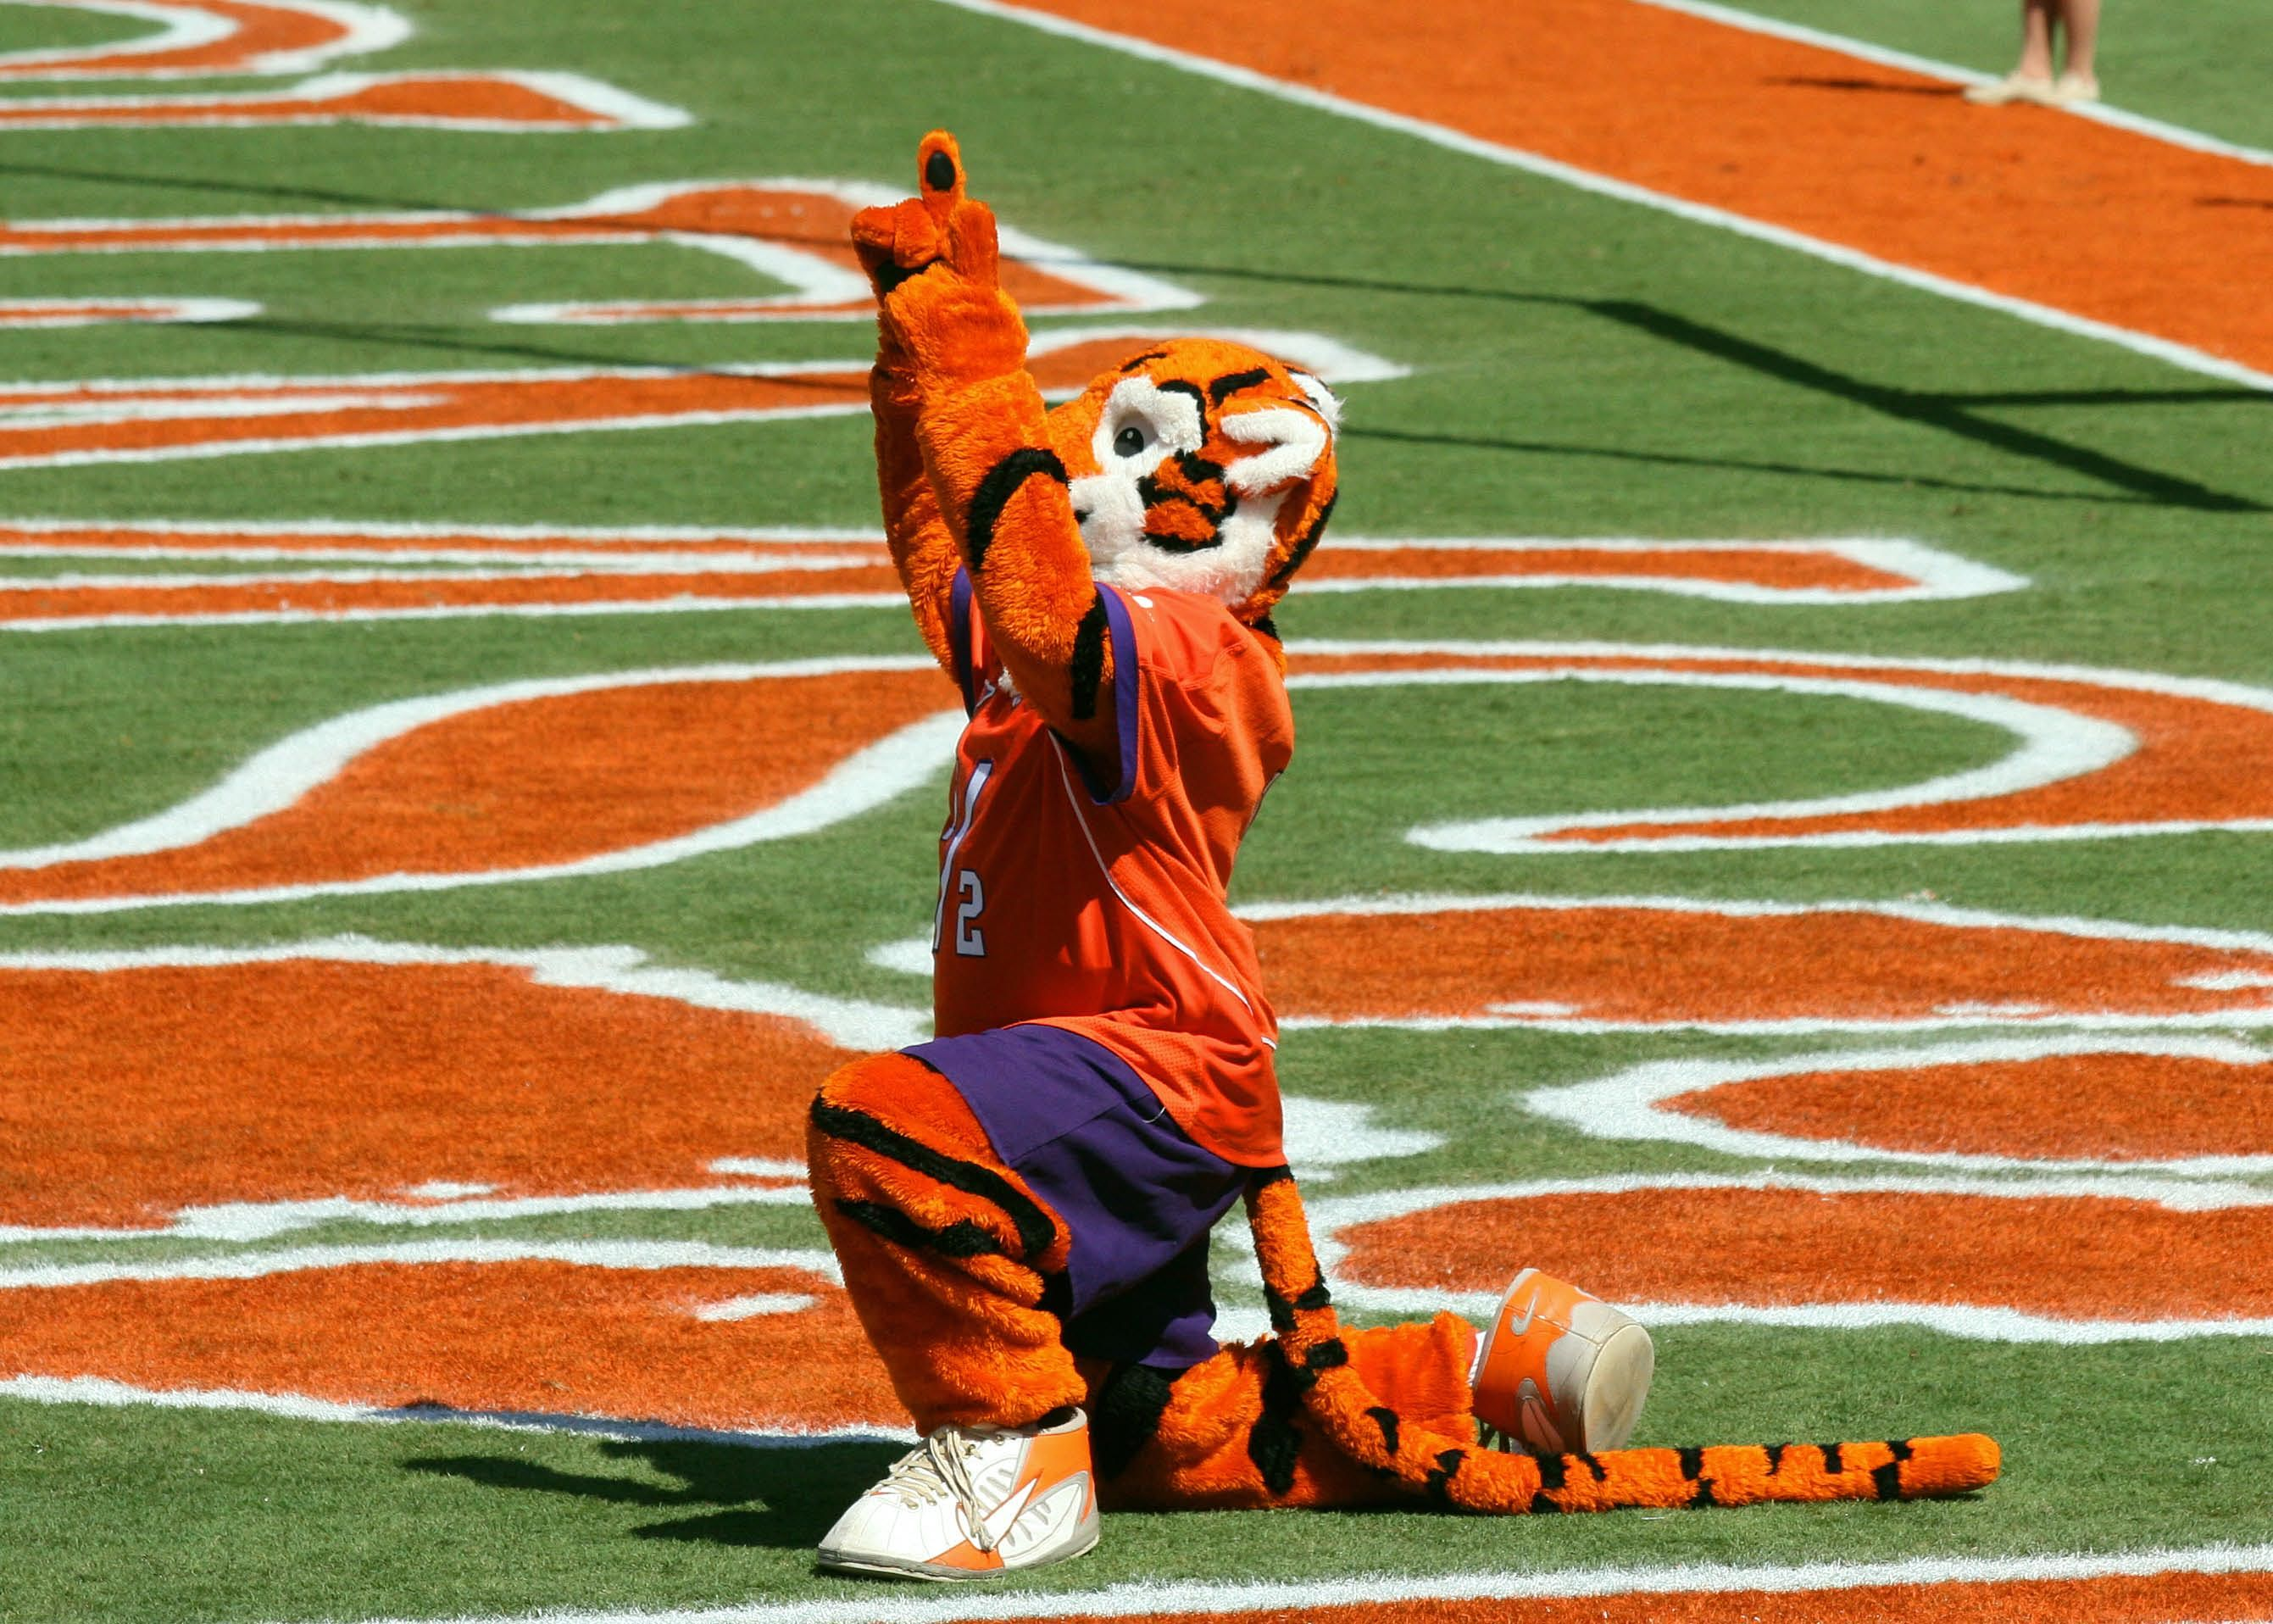 Clemson tiger clemson tigers clemson athletics clemson